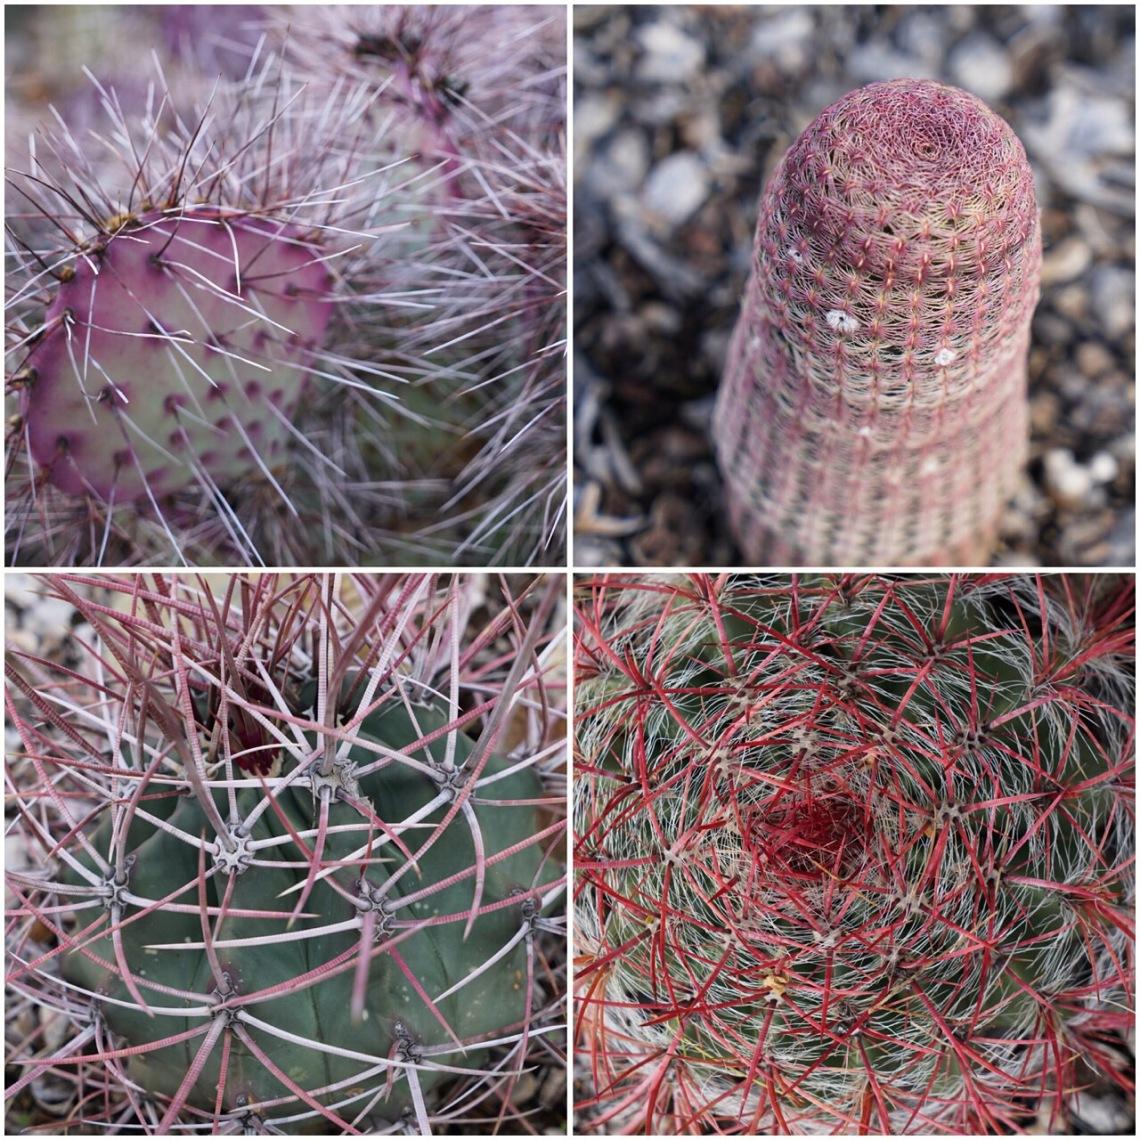 ArizonaSonoraDesertMuseumDec2019-20